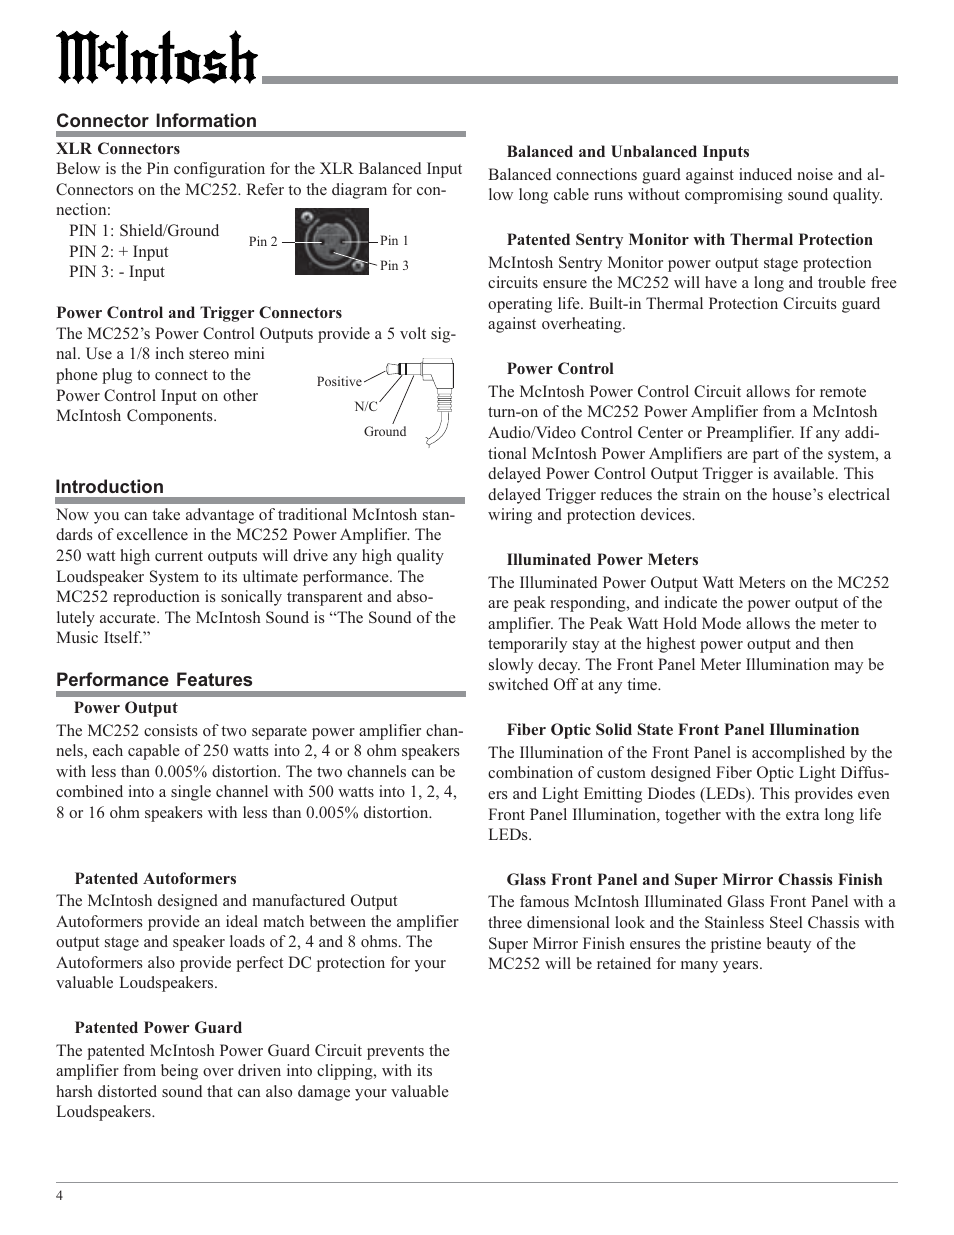 McIntosh MC252 User Manual | Page 4 / 24